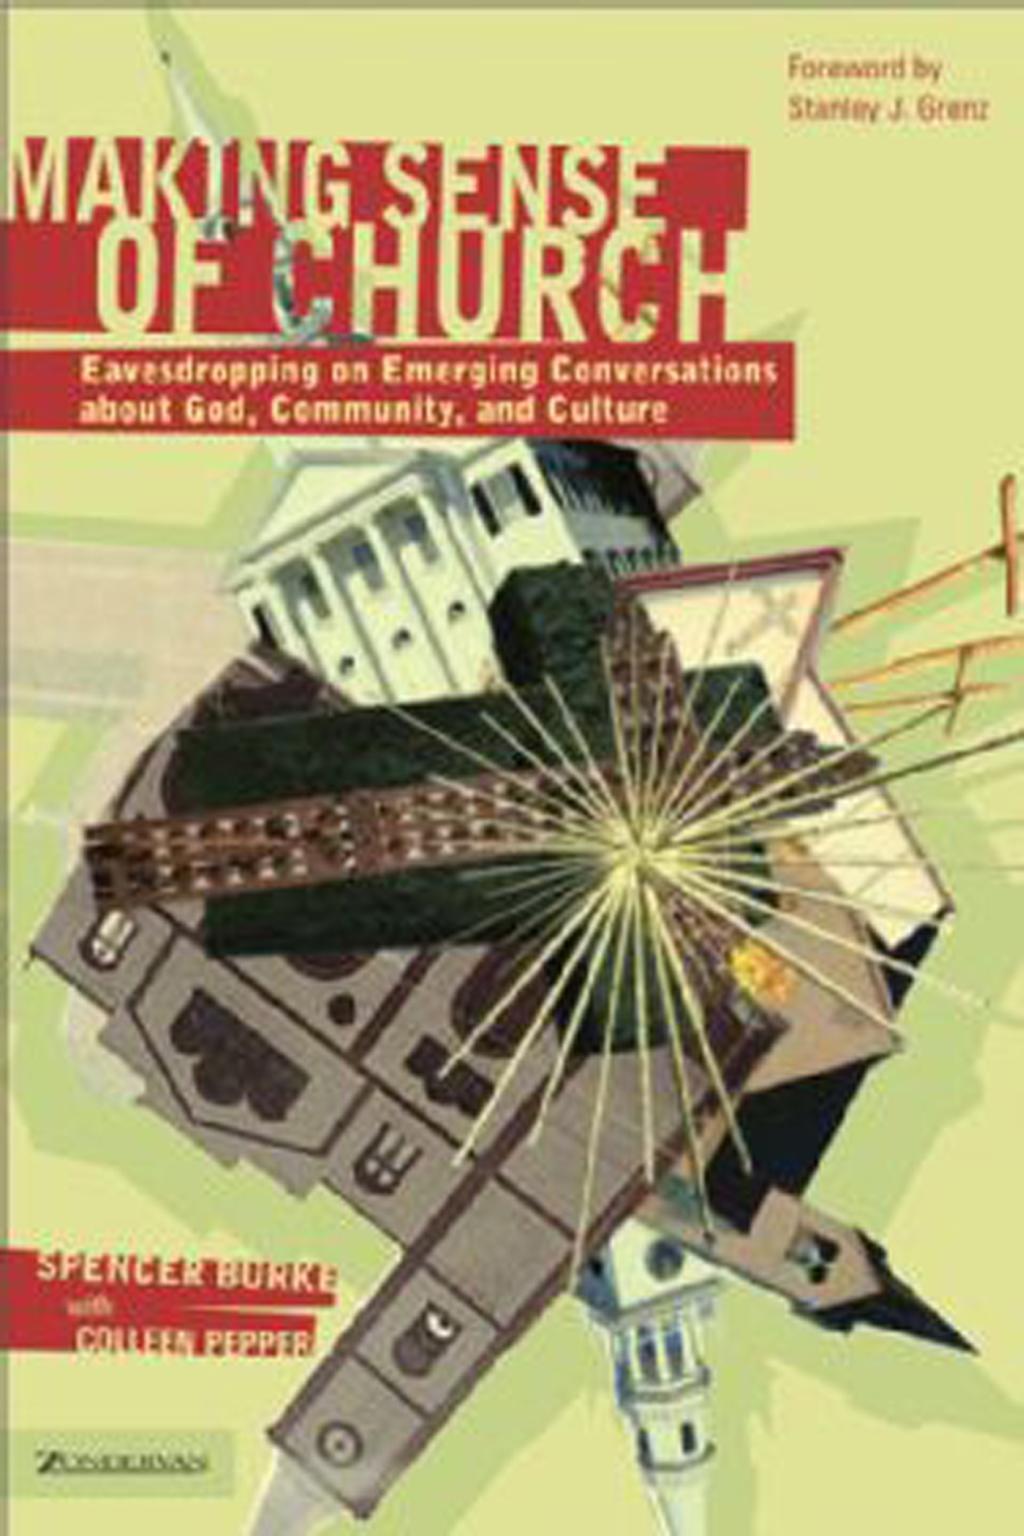 Making Sense of Church